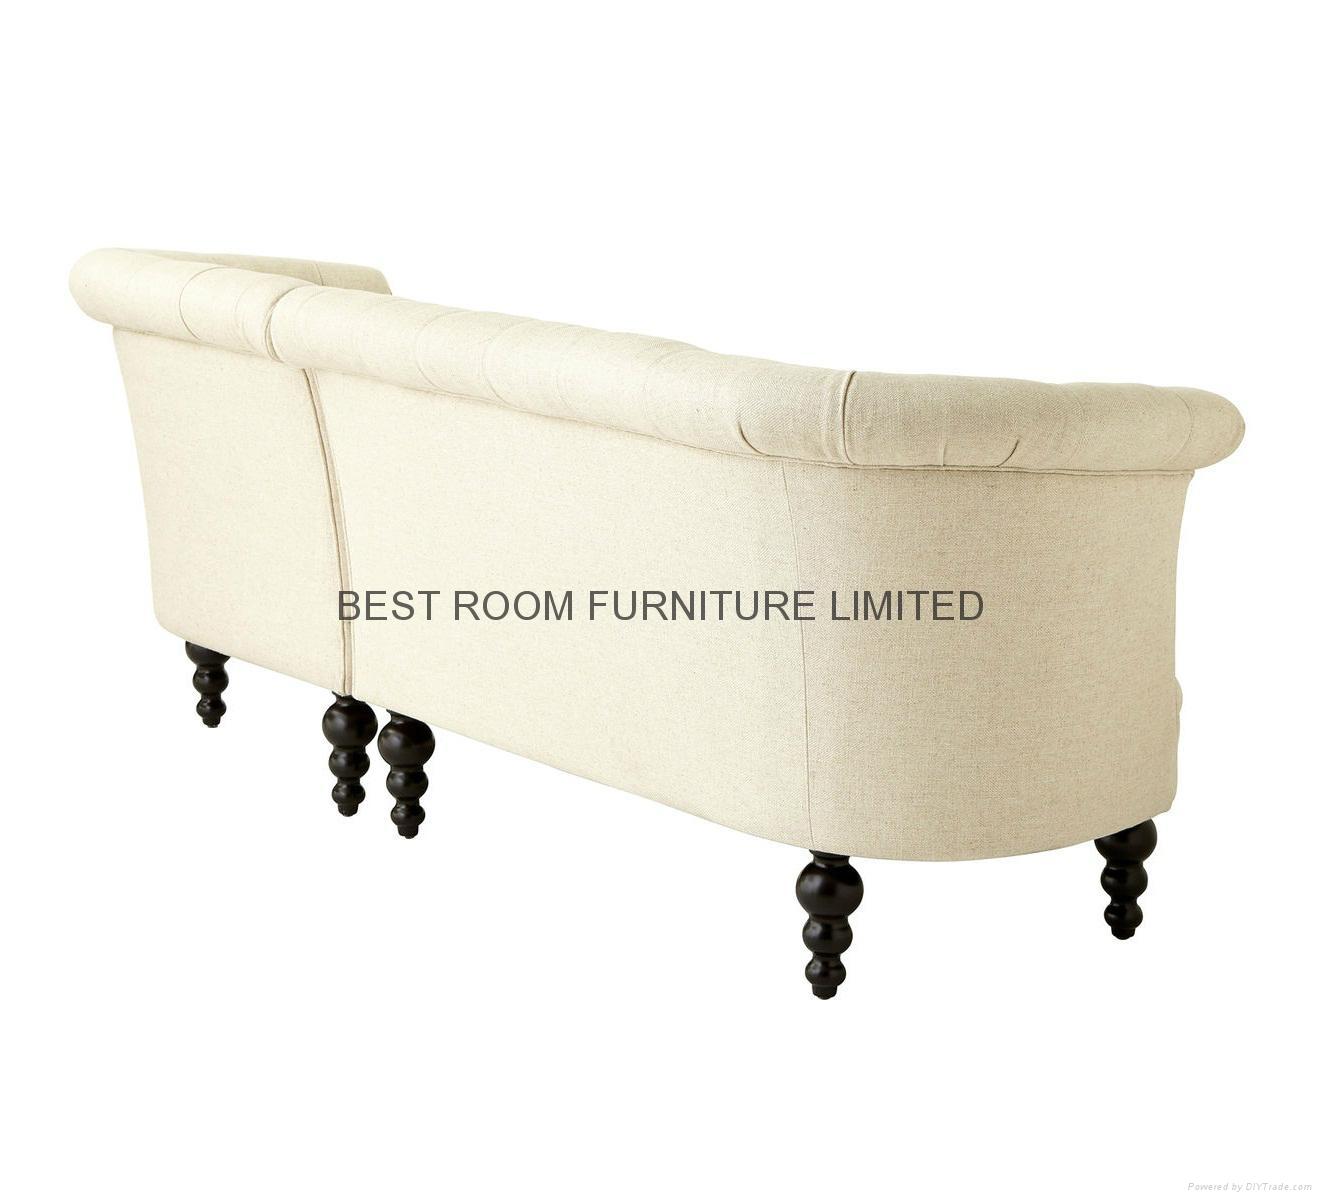 mordern liene  fabric tuffed hot-sold american furniture corner sofa with chaise 2